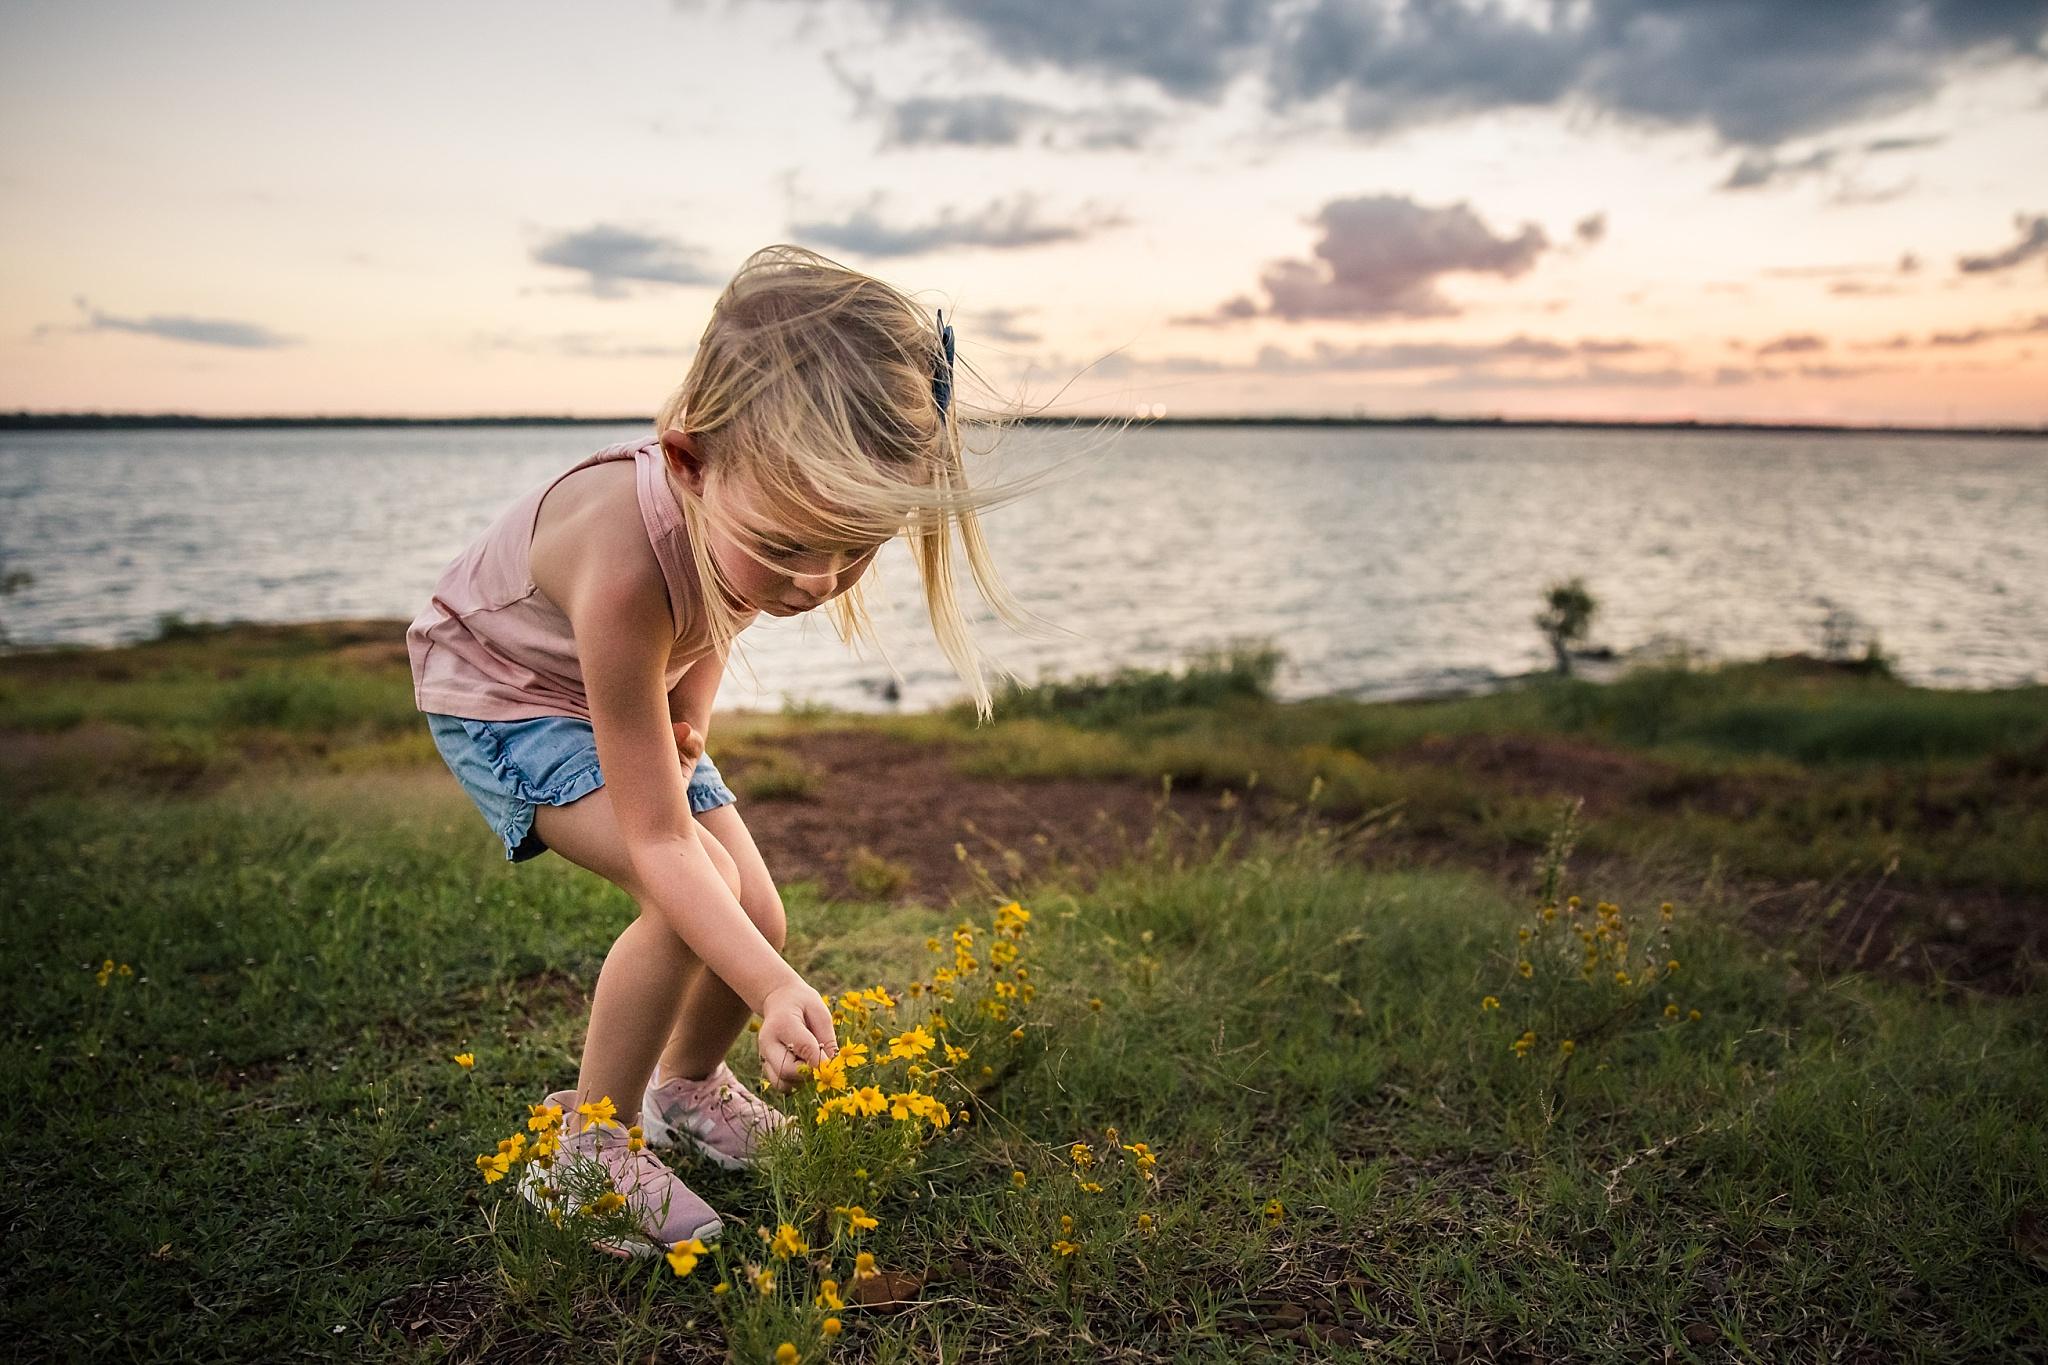 05Yellow Flowers_Libby Grohmann.jpg